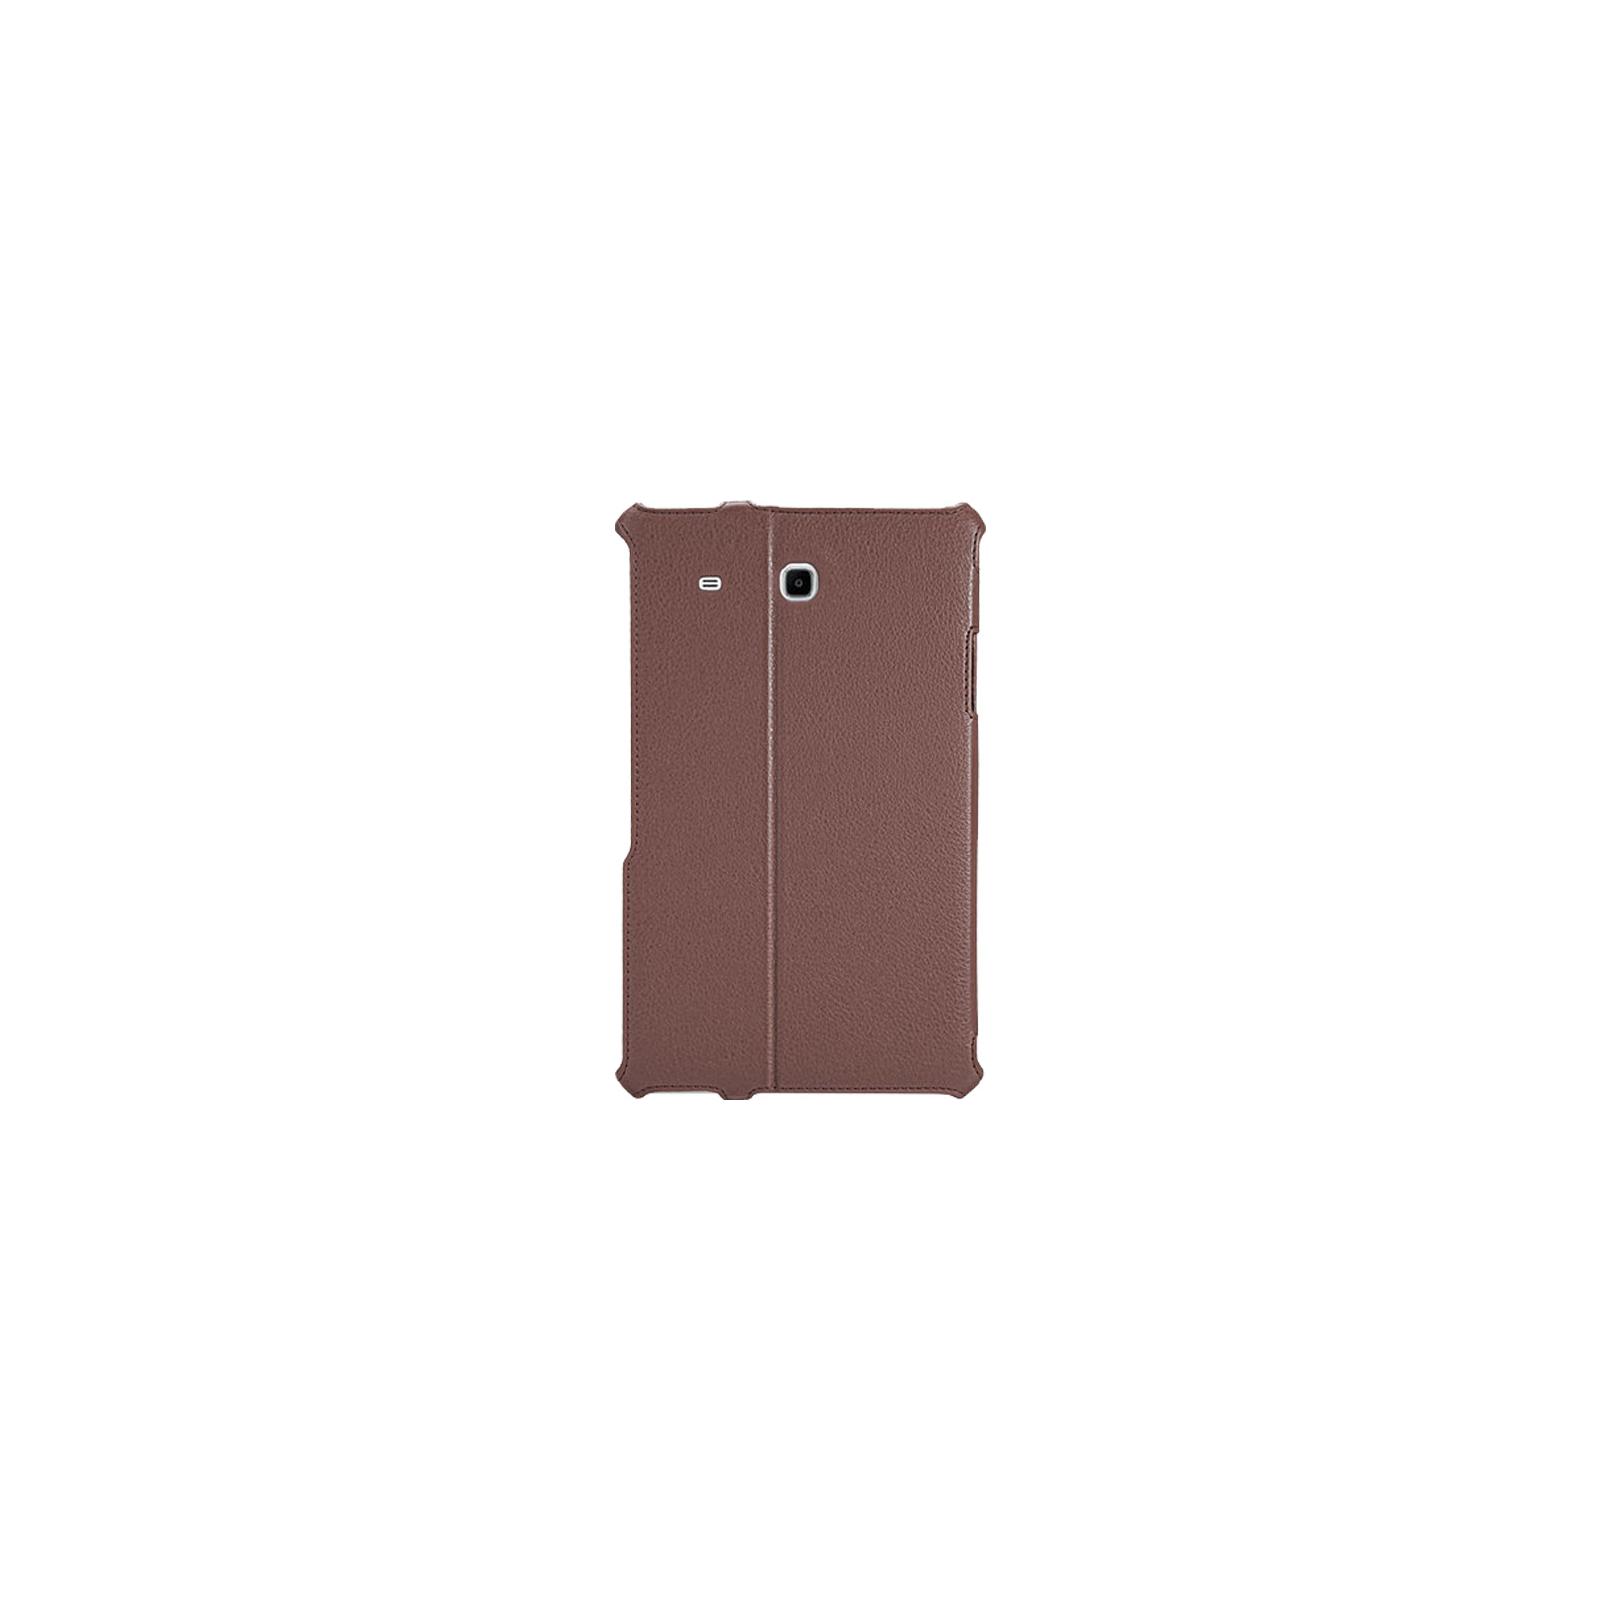 Чехол для планшета AirOn для Samsung Galaxy Tab E 9.6 brown (4822352777128) изображение 2